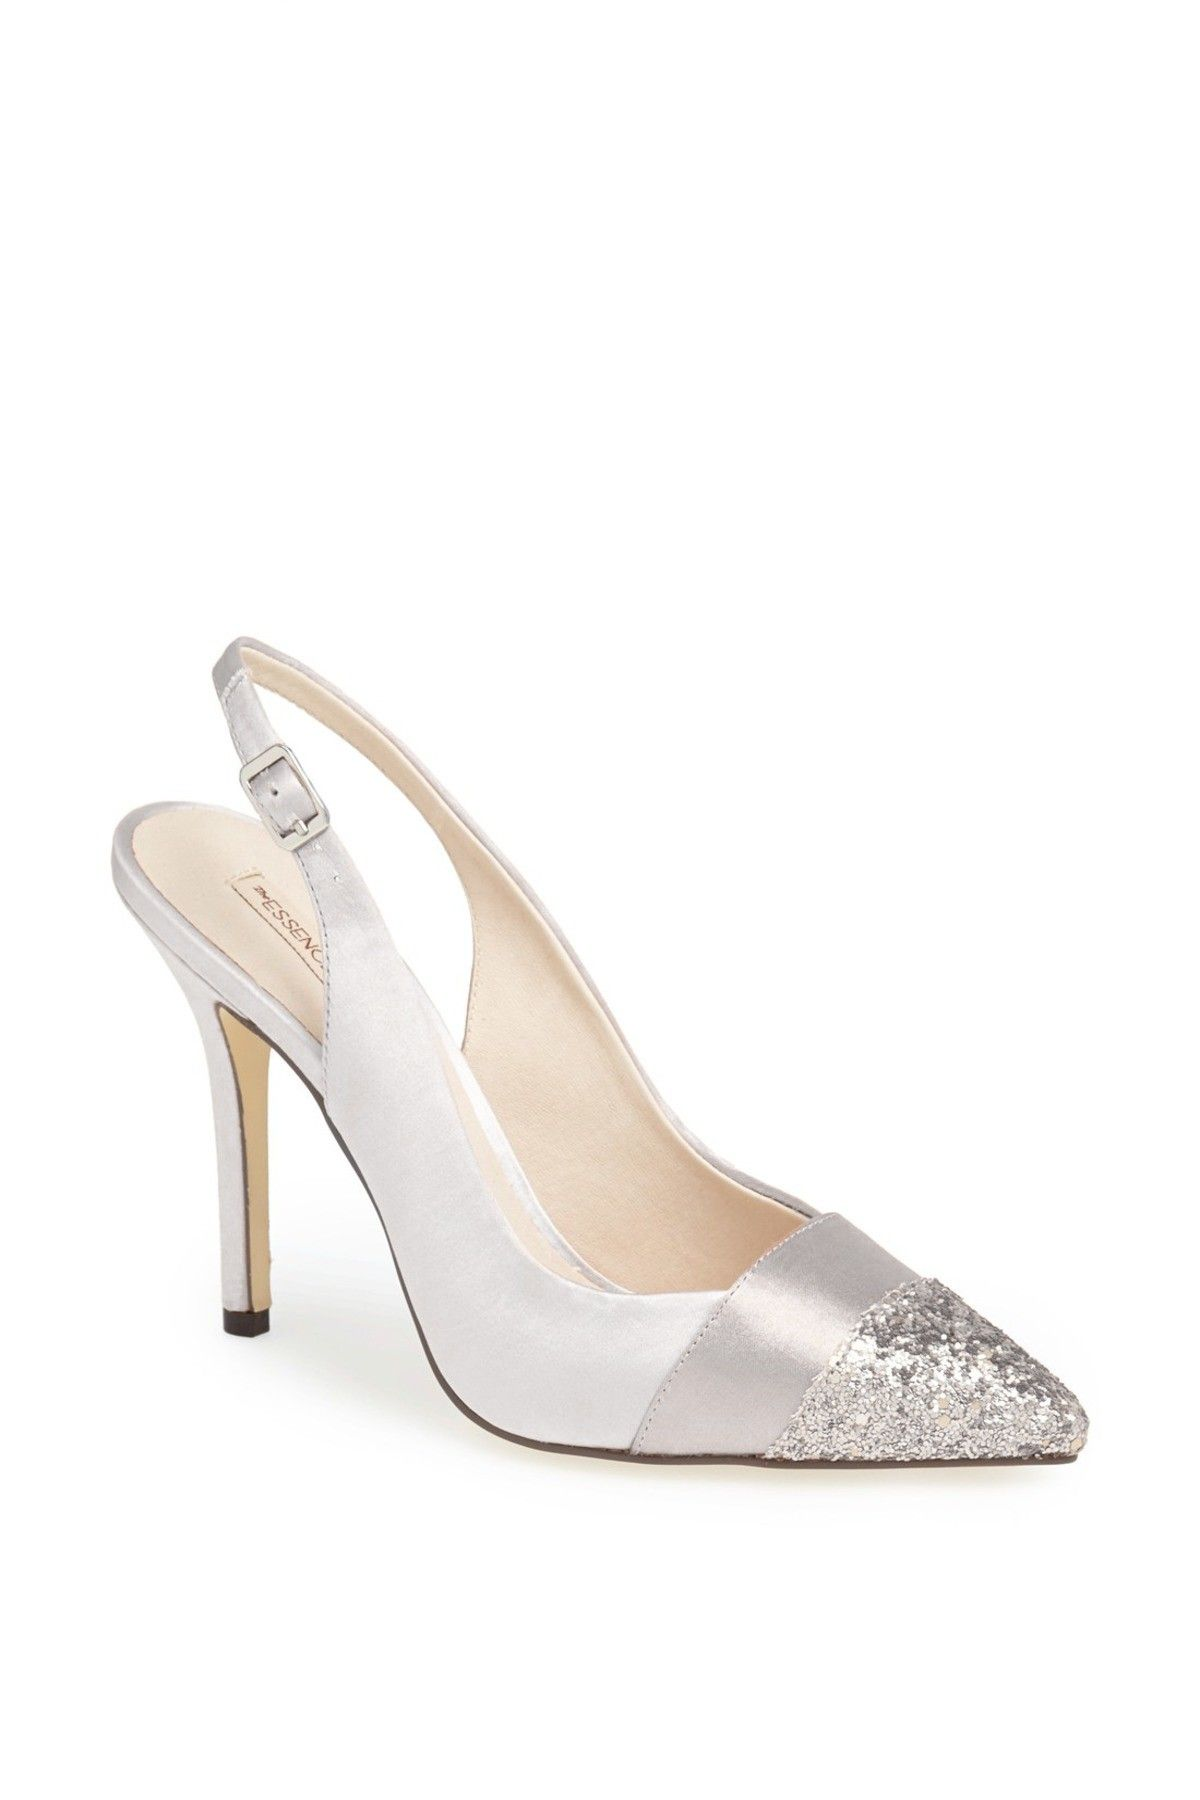 Menbur 'Taverner' Pump Bridal shoes, Beautiful shoes